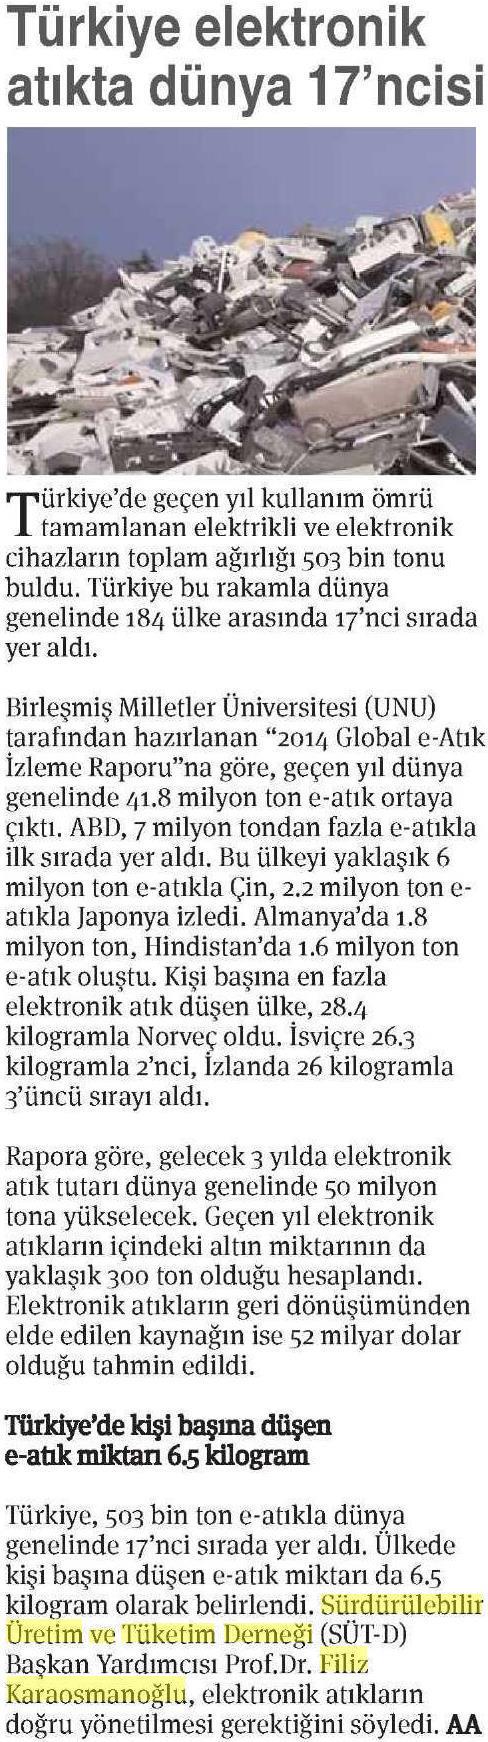 Ekonomi Gazetesi 25.04.2015